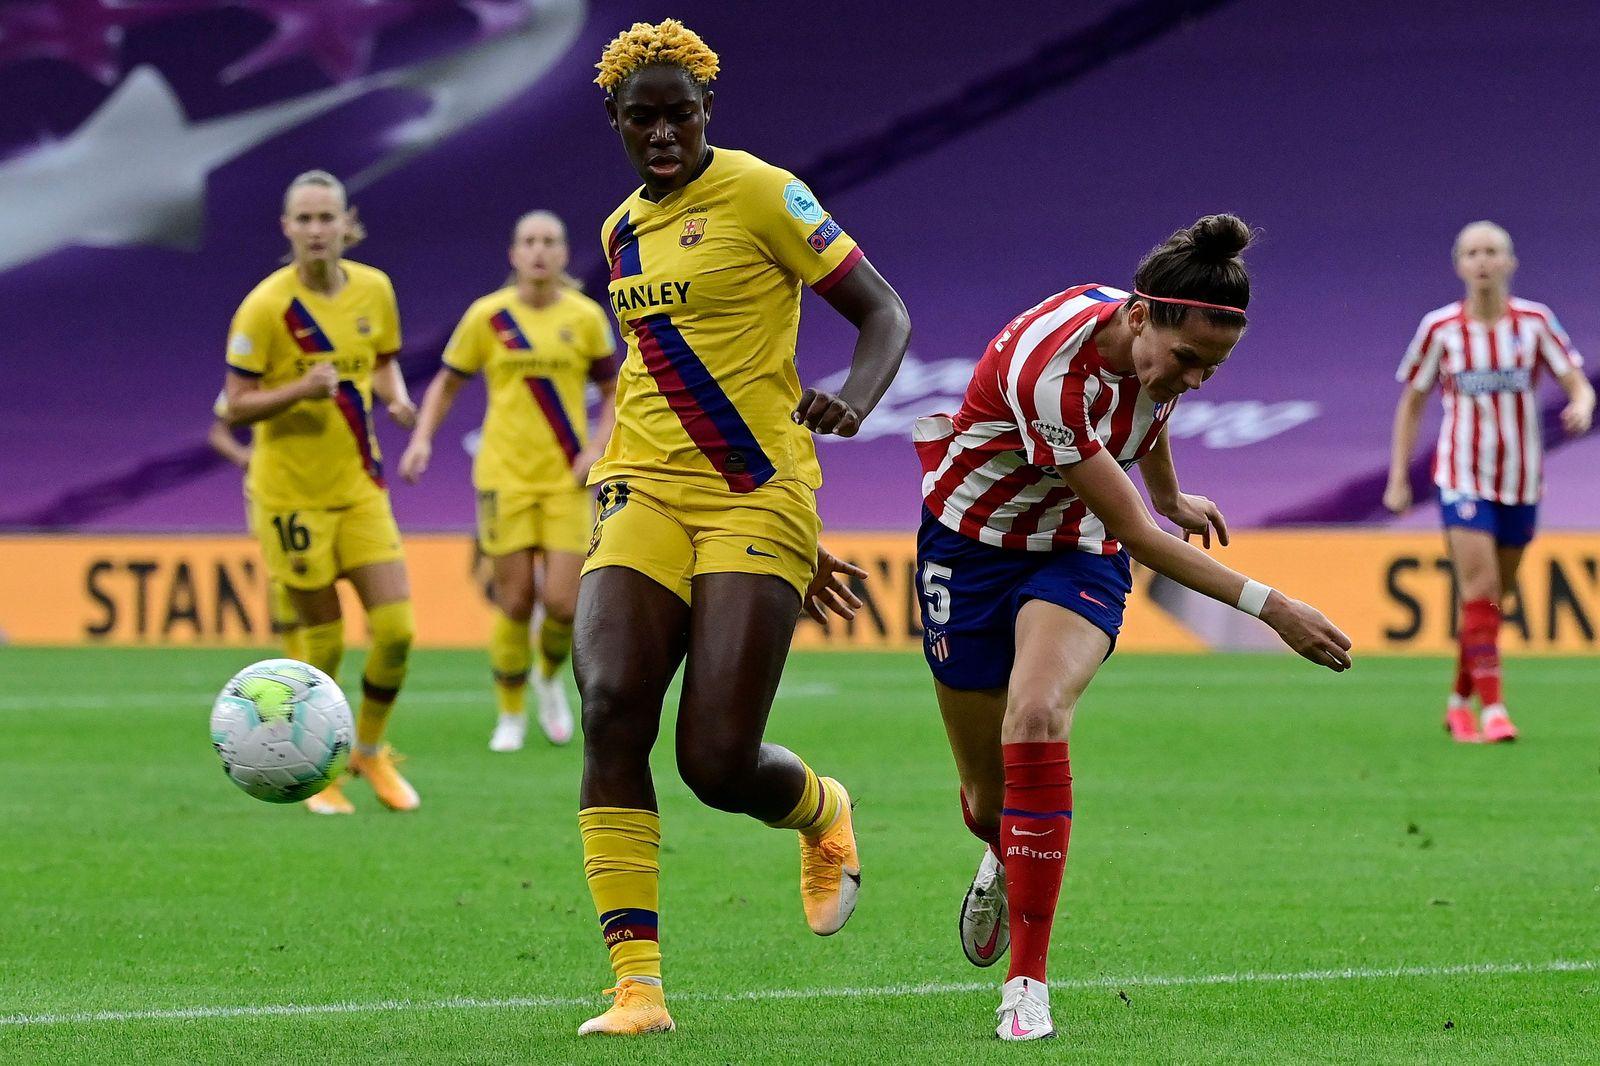 FBL-EUR-C1-WOMEN-ATLETICO MADRID-BARCELONA